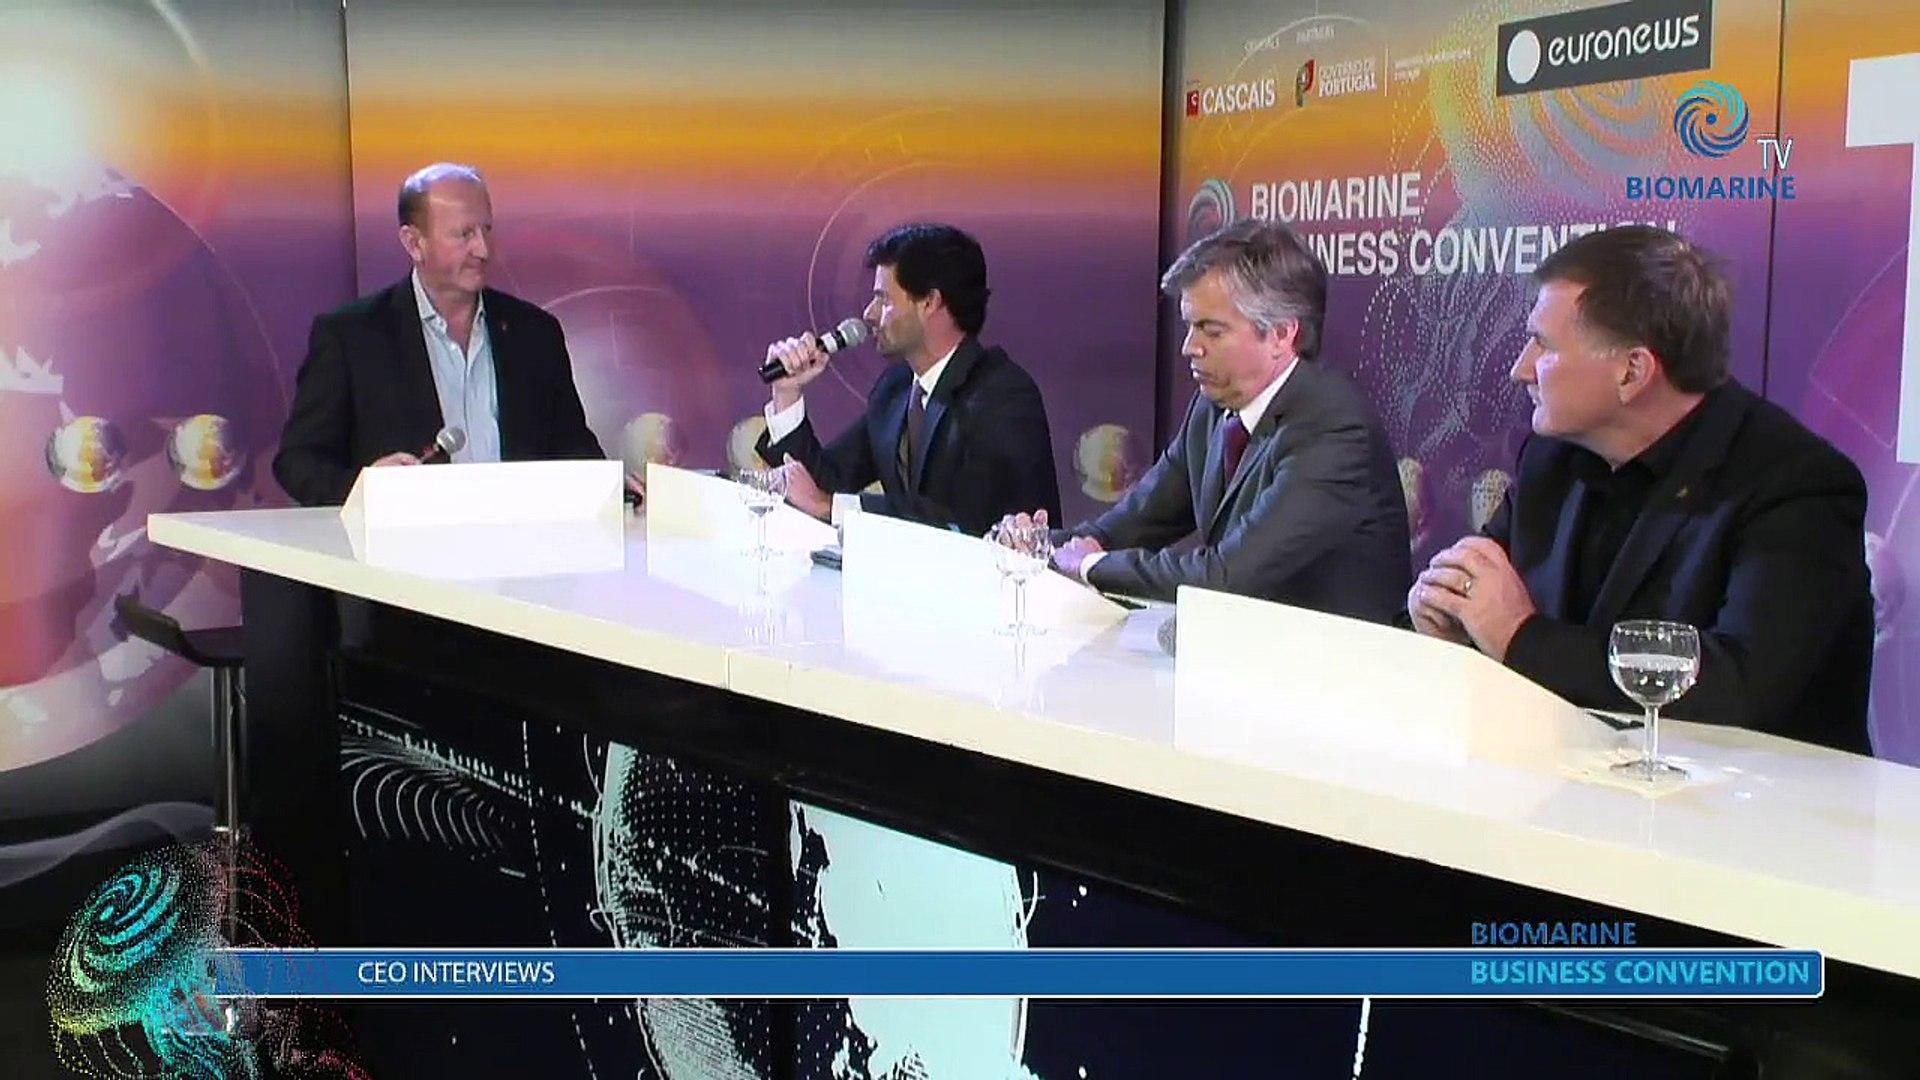 BIOMARINE_J2_CEO Interviews 14h.mp4